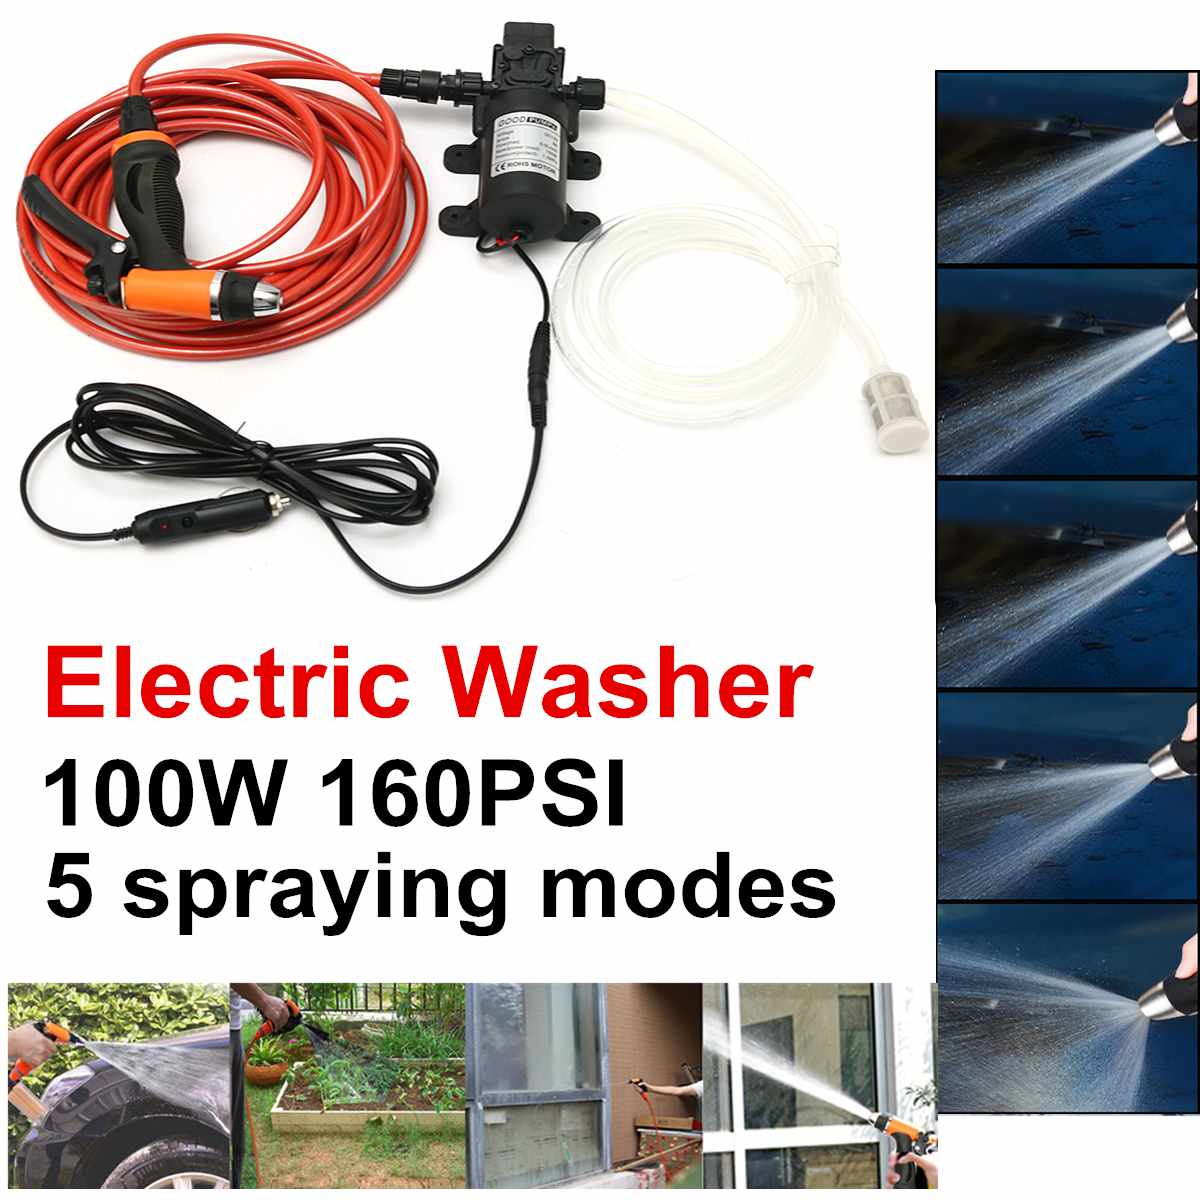 12V Portable 100W 160PSI High Pressure Car Electric Washer Auto Wash Pump Set100W Car Washer 12V Machine Pump High Pressure Clea